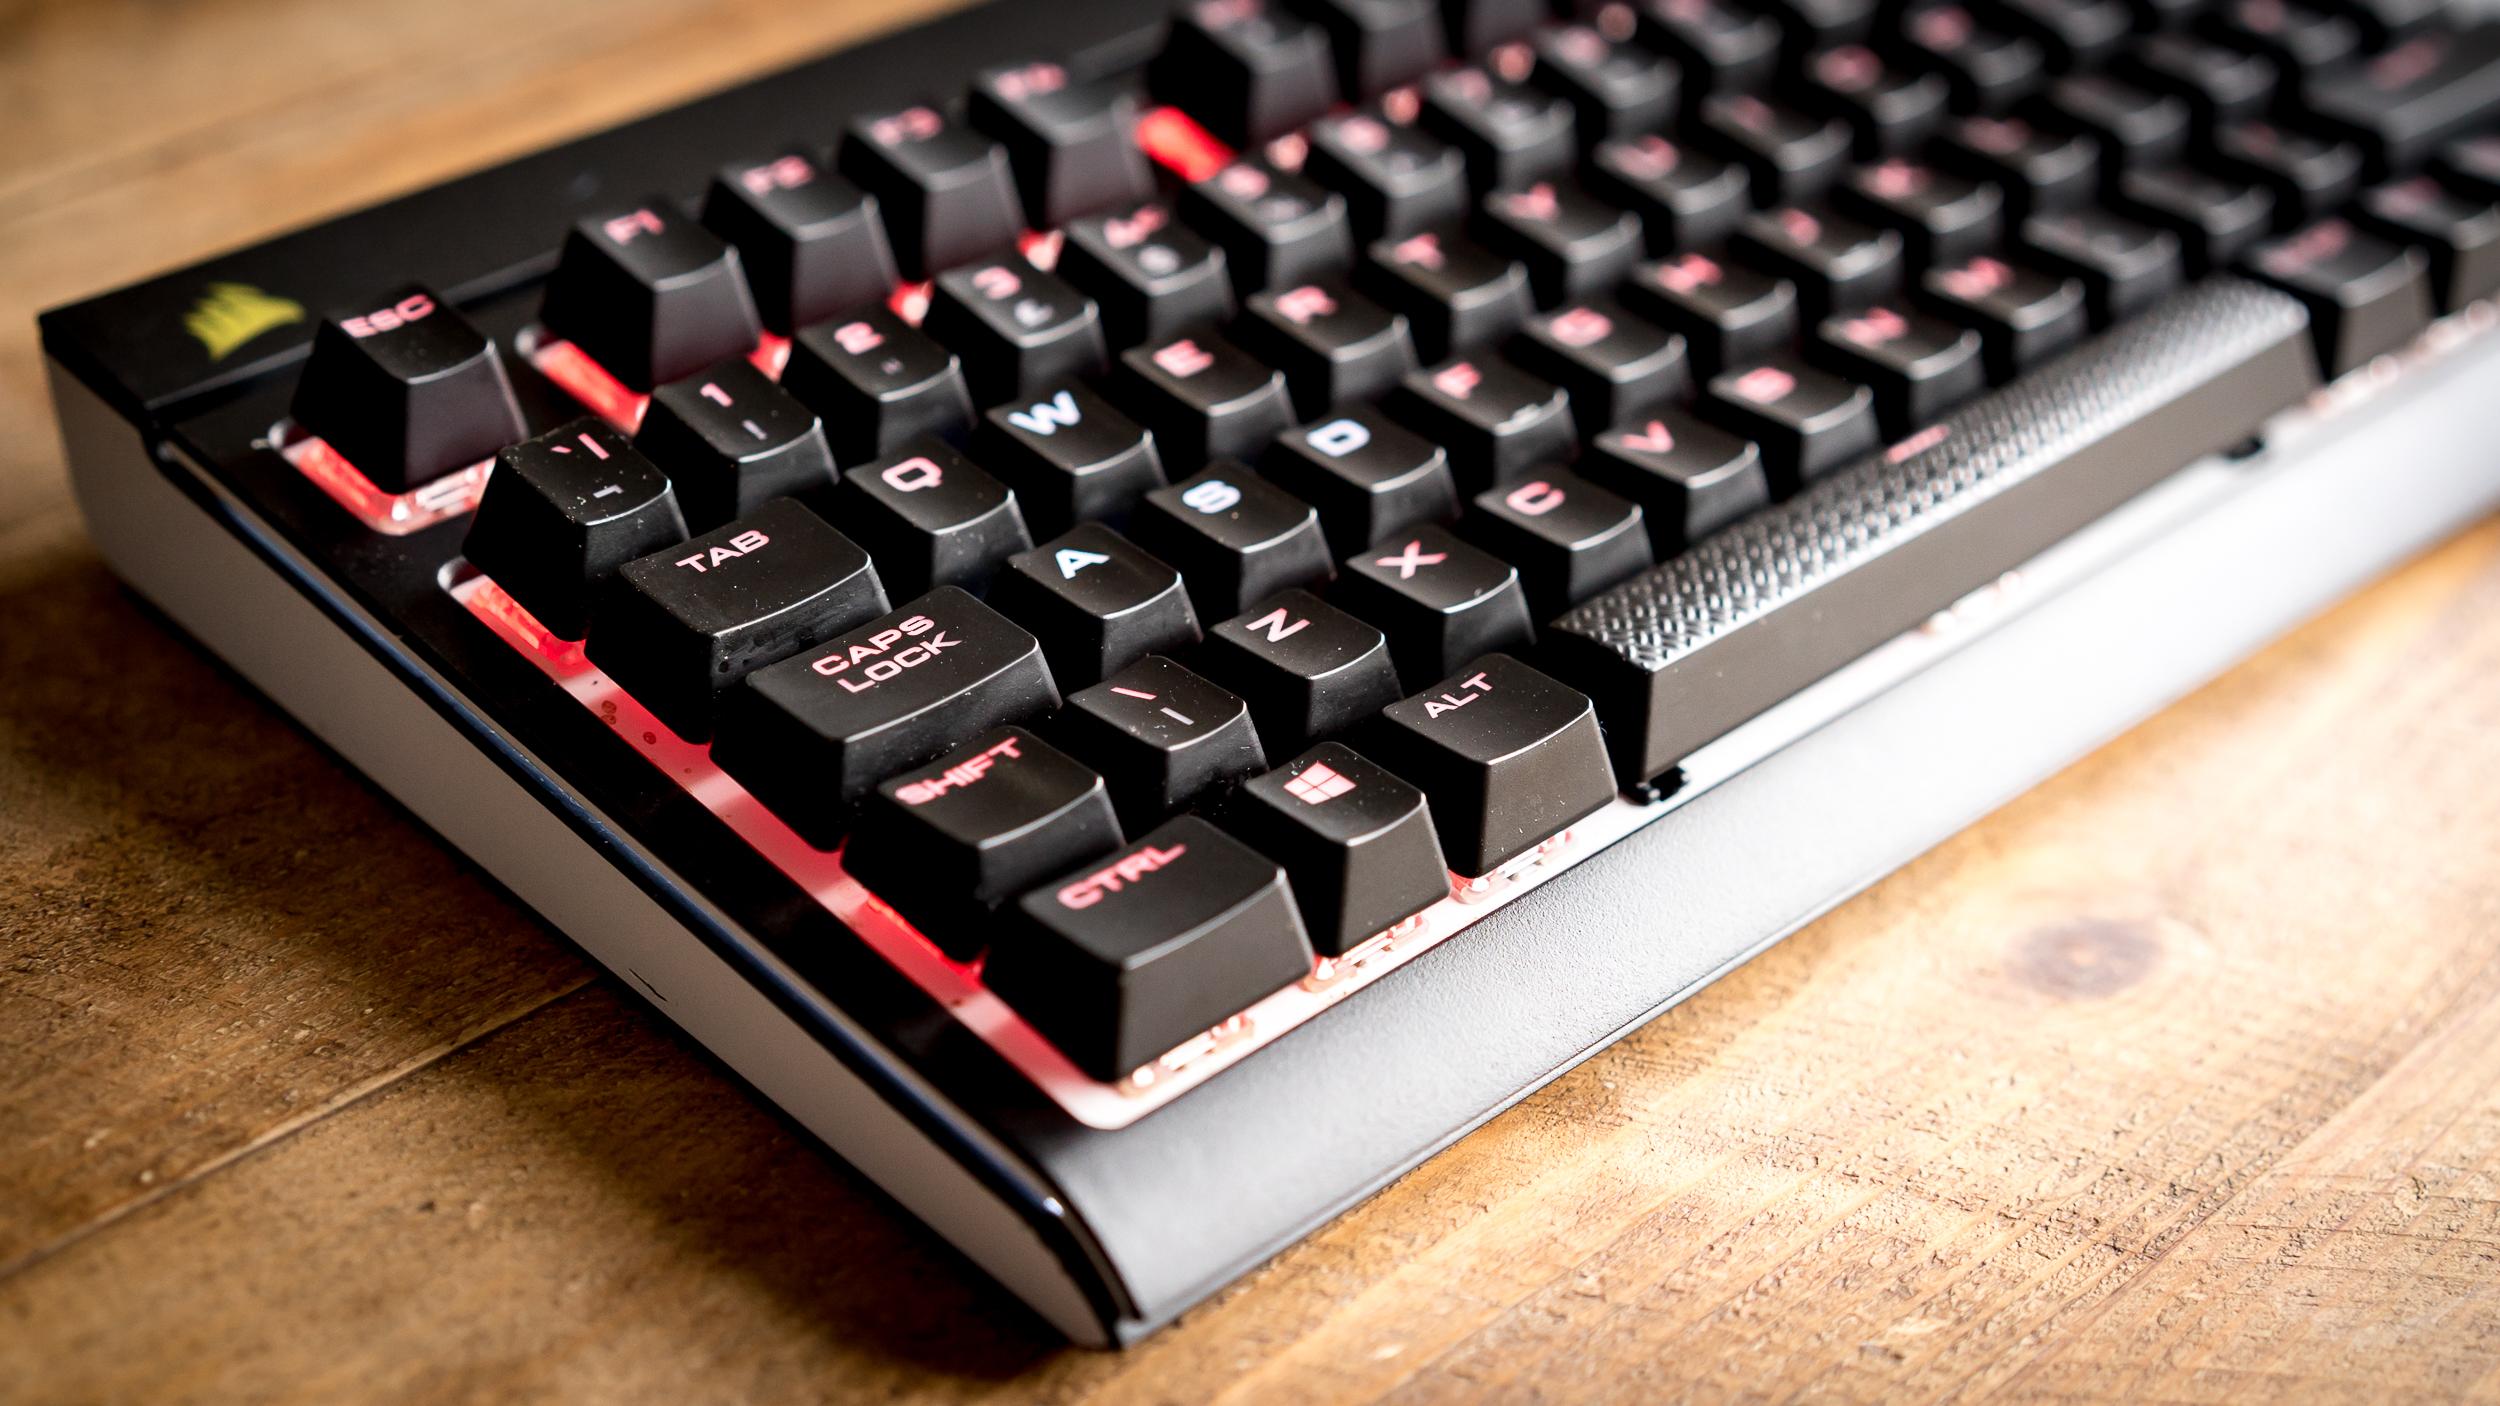 corsair k70 lux mechanical gaming keyboard review